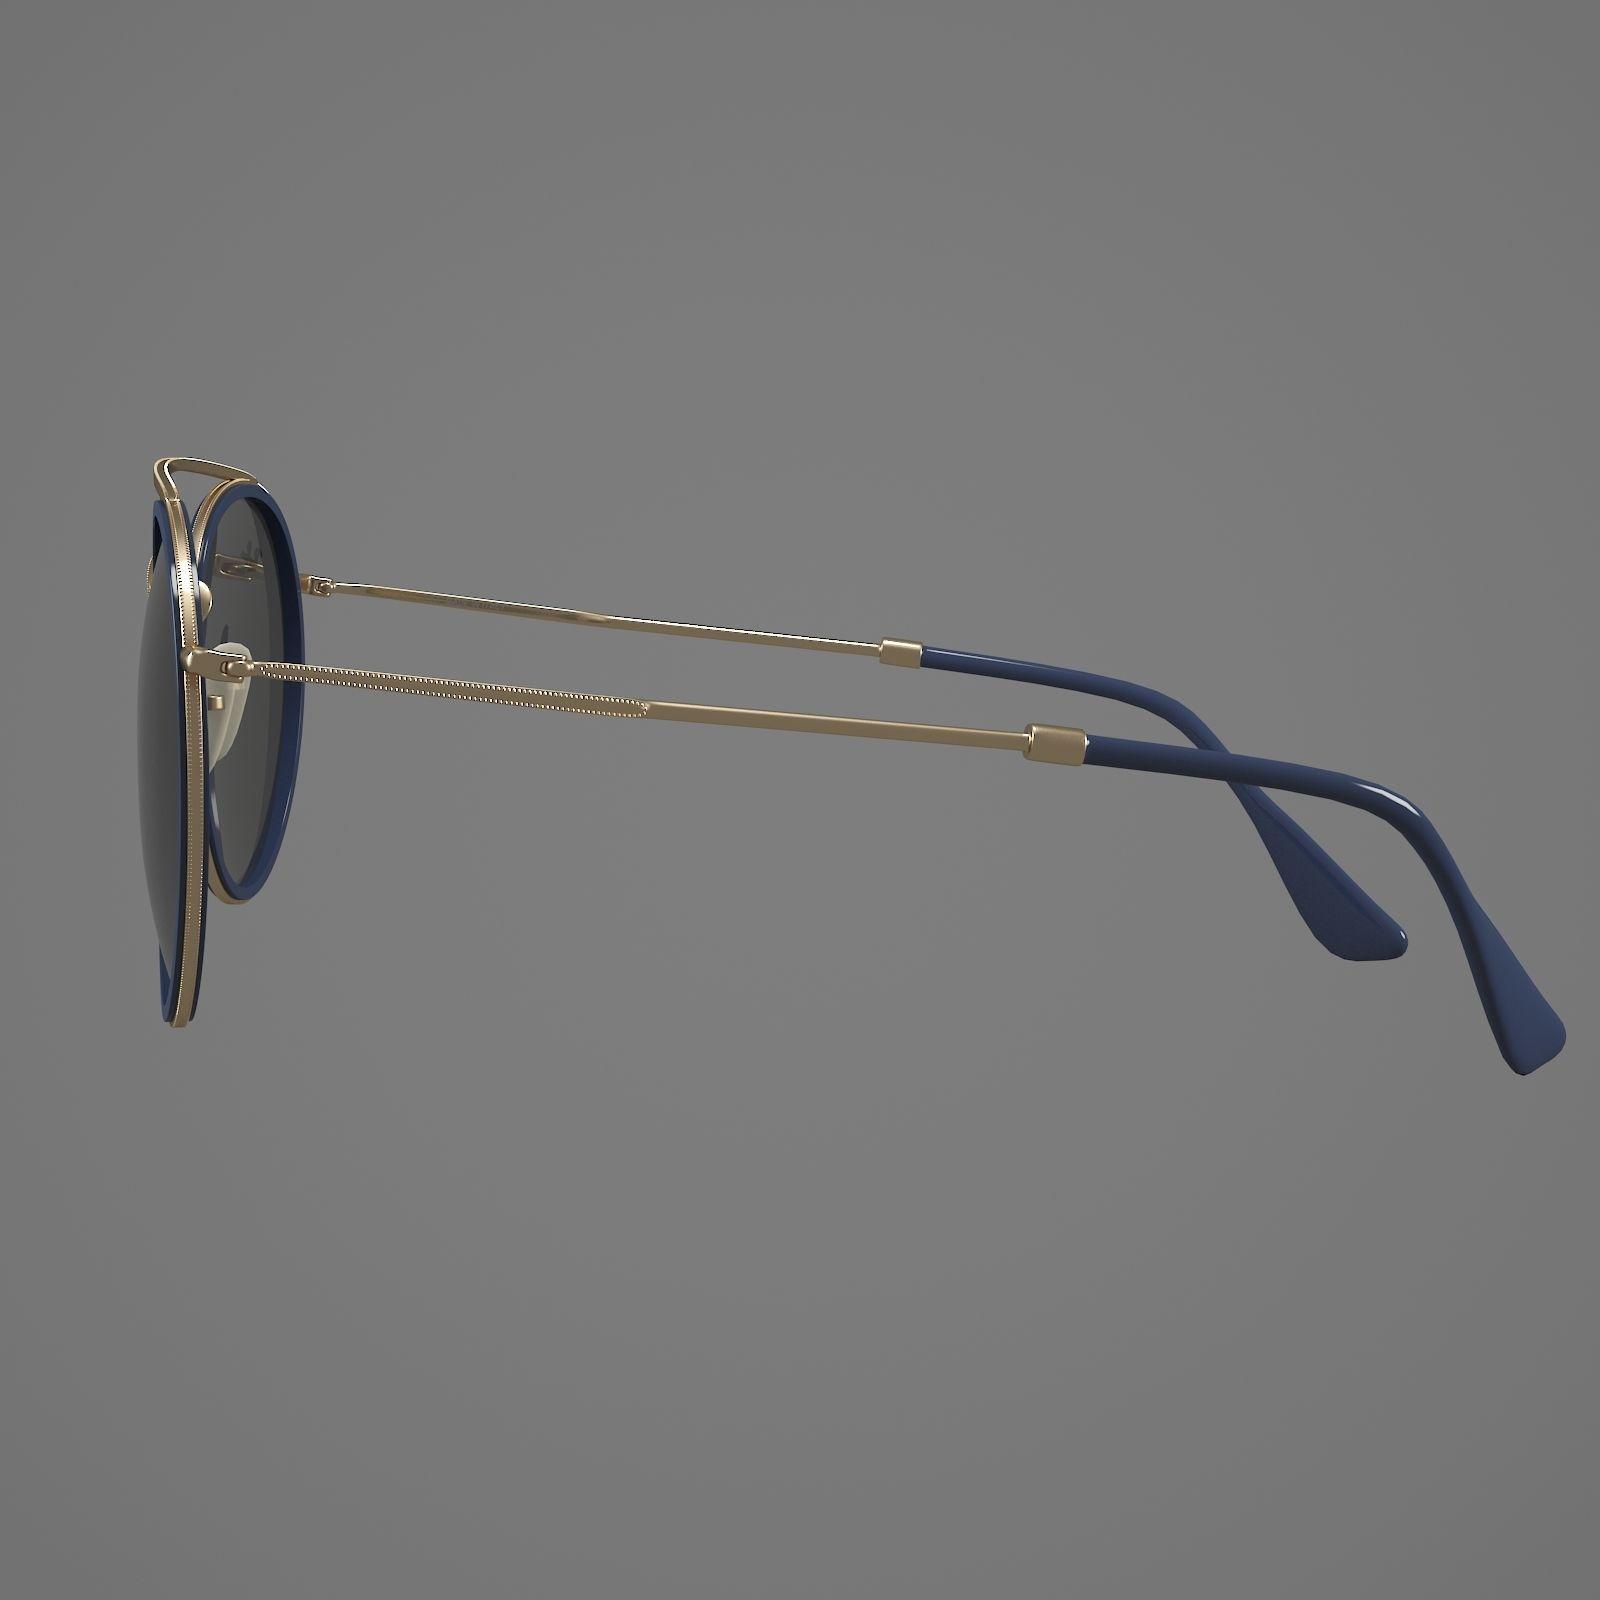 27ff806601 ... rayban glasses 3d model max obj mtl 3 ...